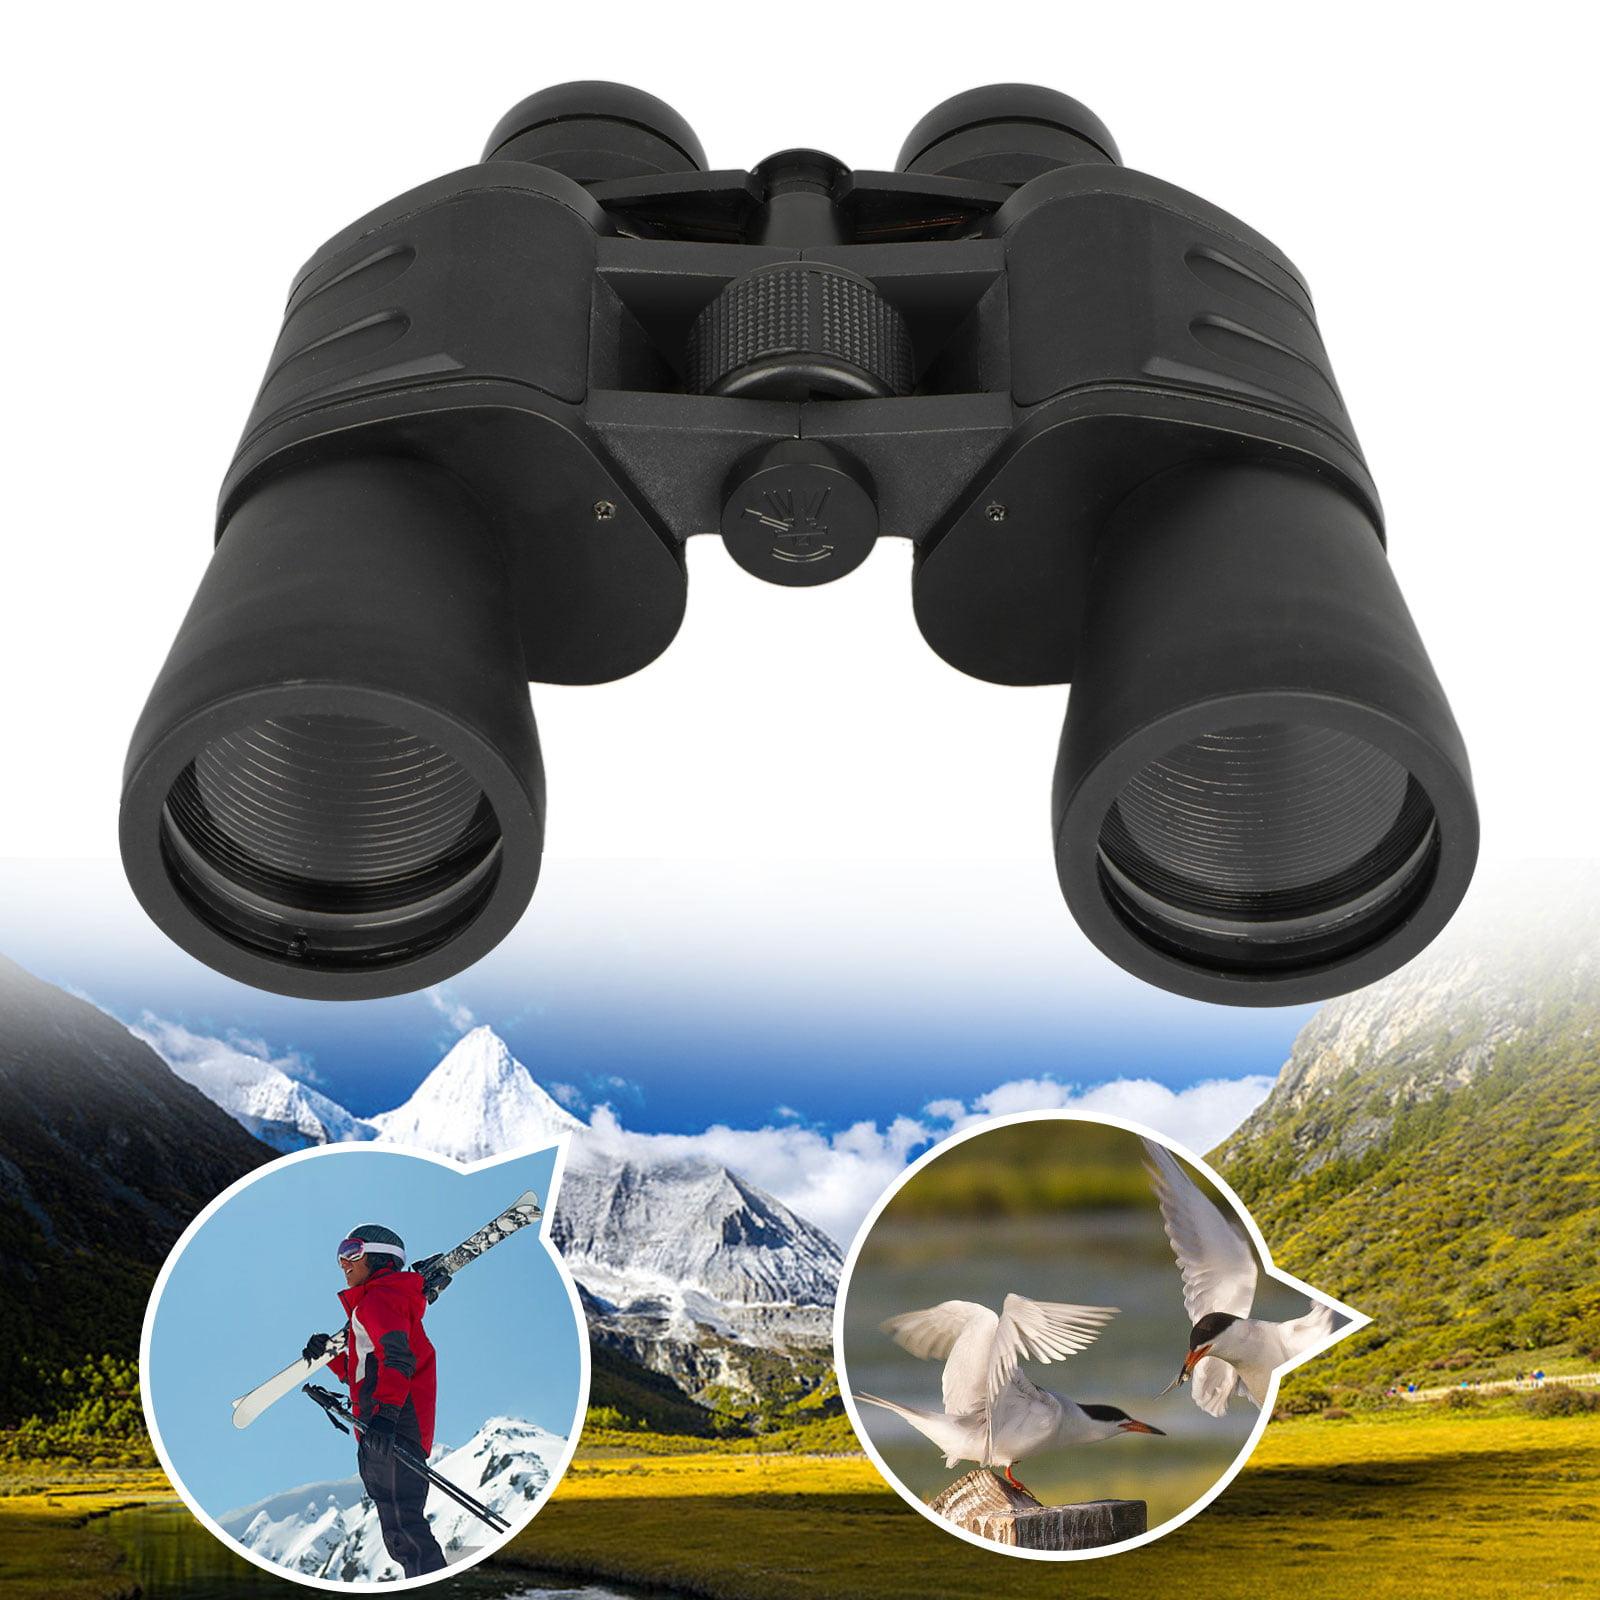 Quick Focus Binoculars, 180x100 Zoom Waterproof Wide Angle Telescope with Low Night Vision for Outdoor Traveling, Bird Watching, Great Present